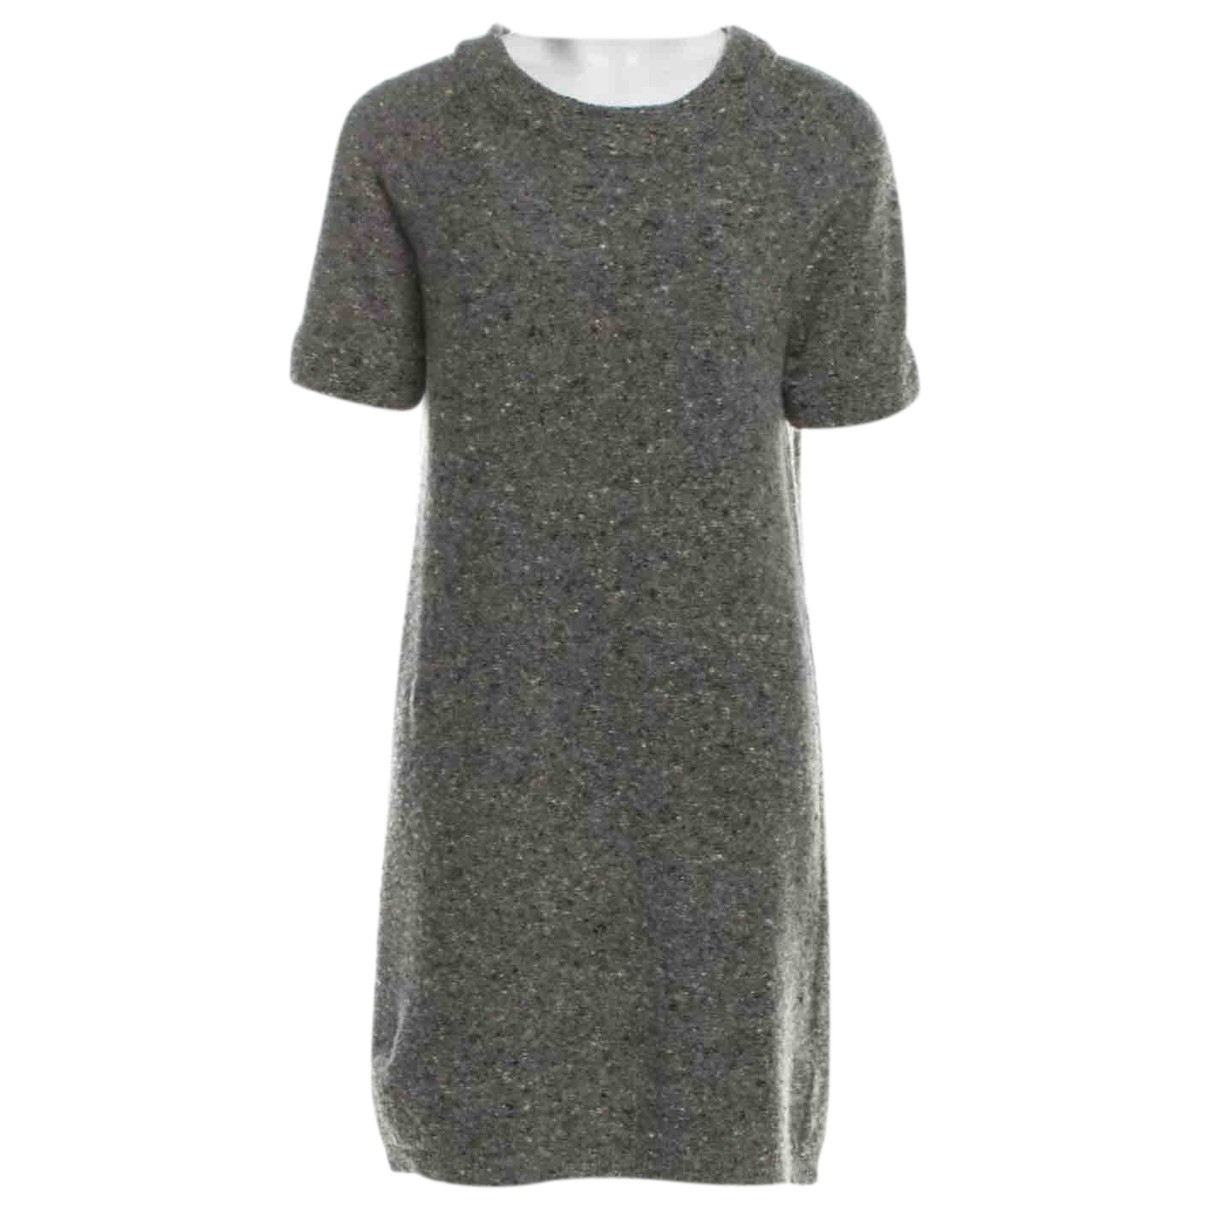 Bottega Veneta \N Brown Cashmere dress for Women 40 IT